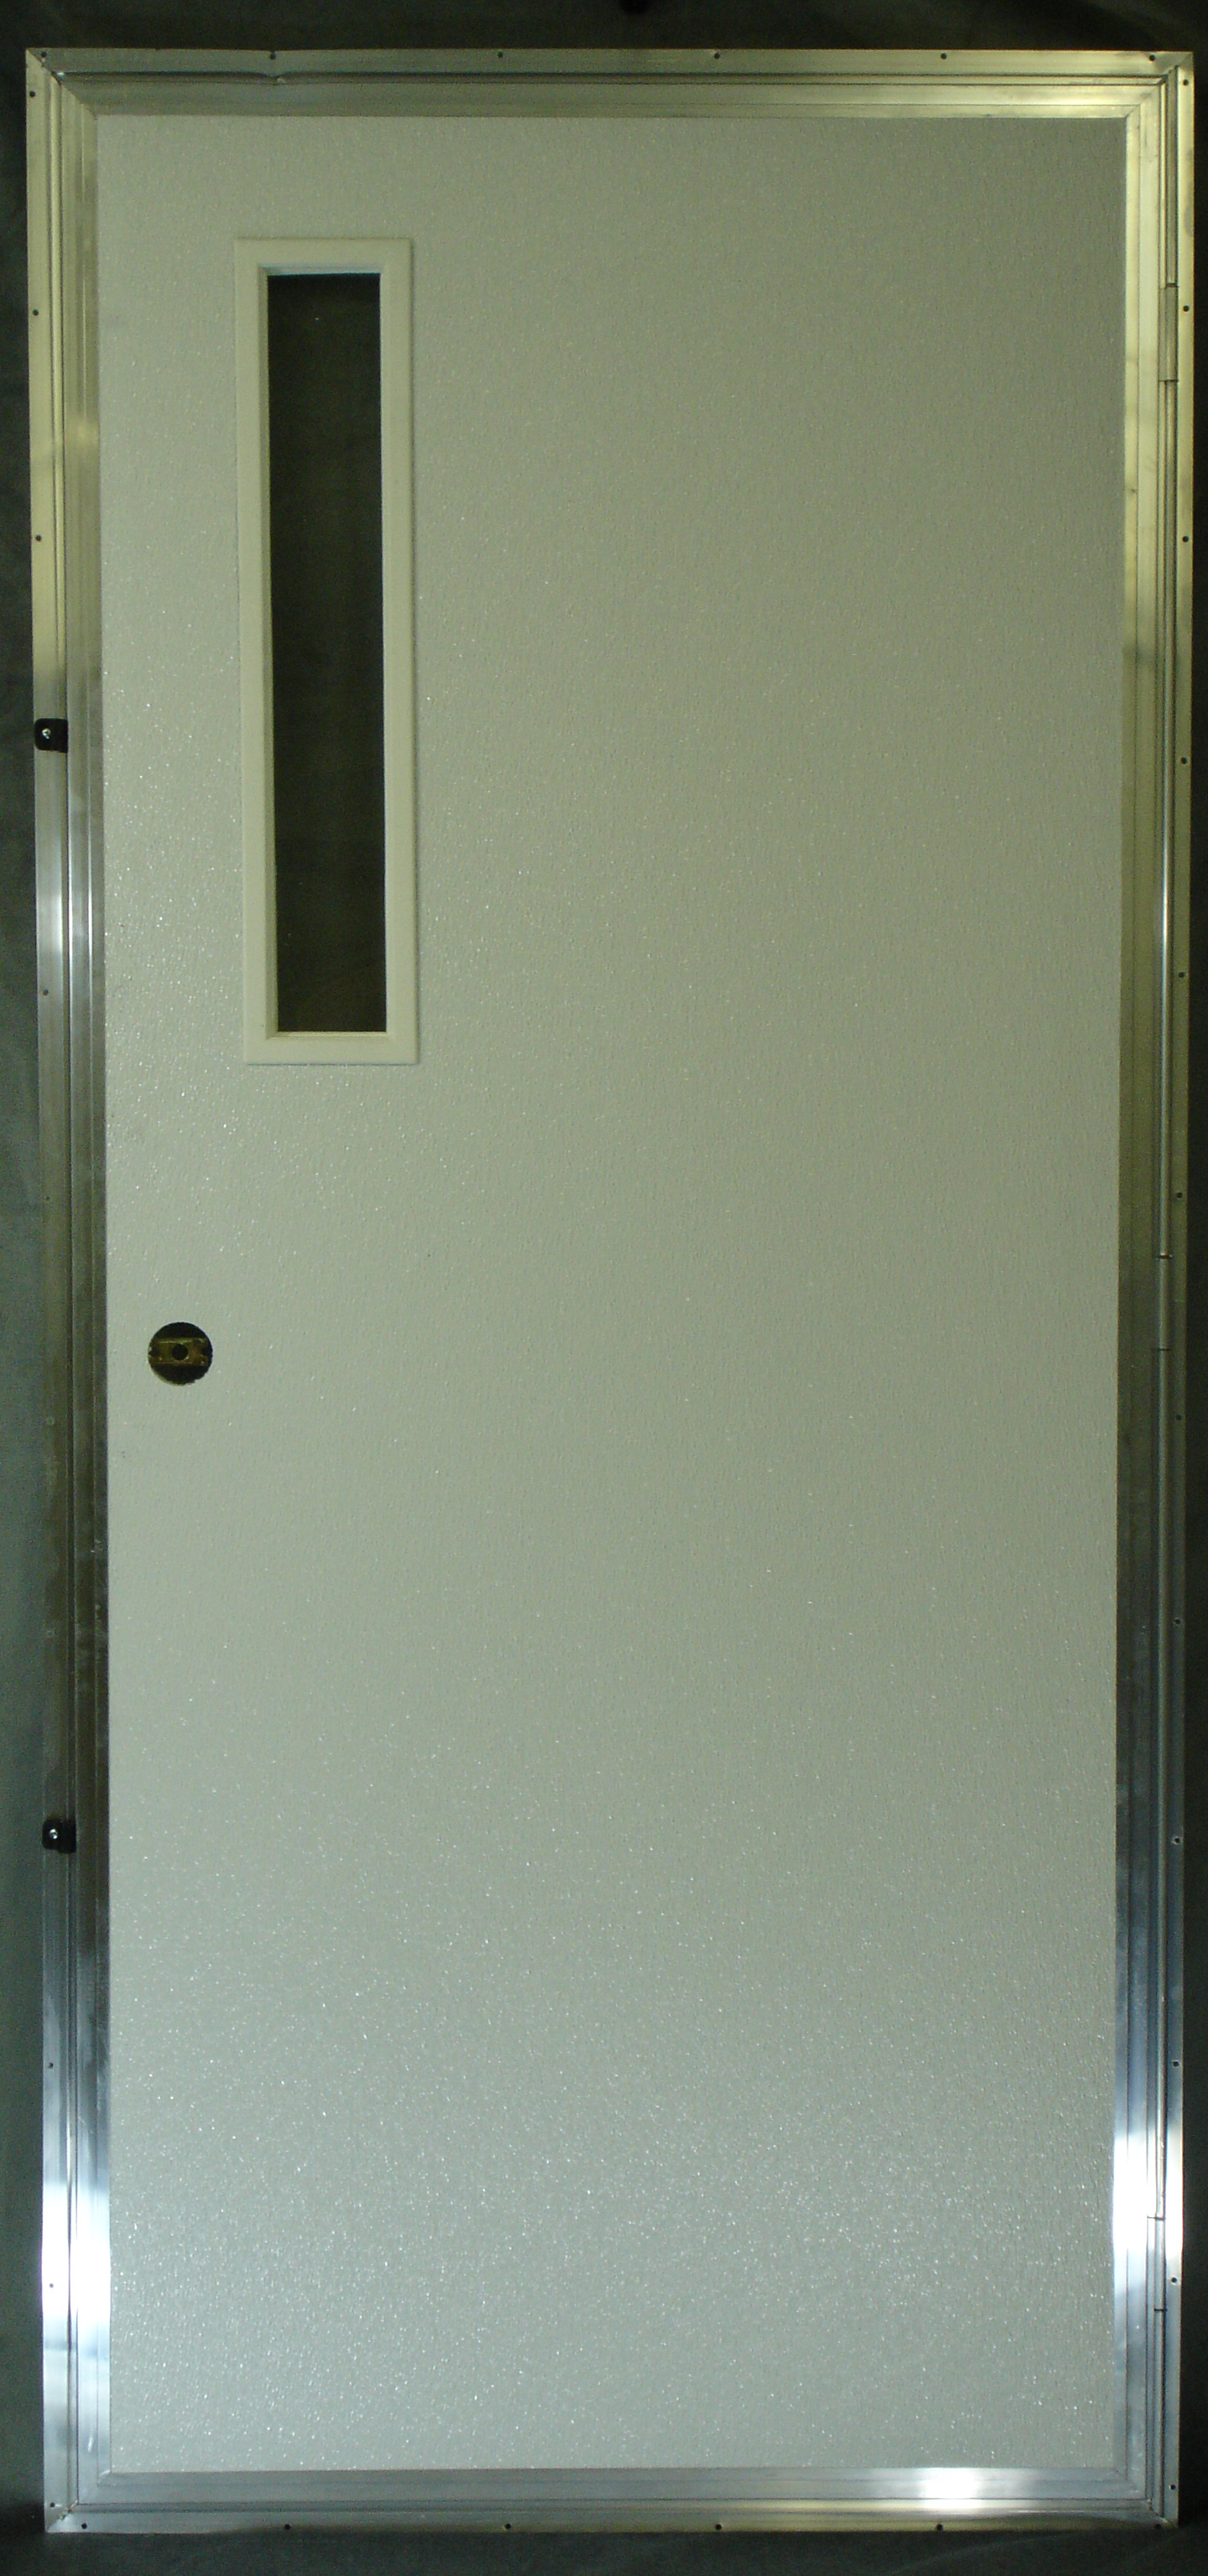 Mobile Home Type Door Fiberglass Royal Durham Supply